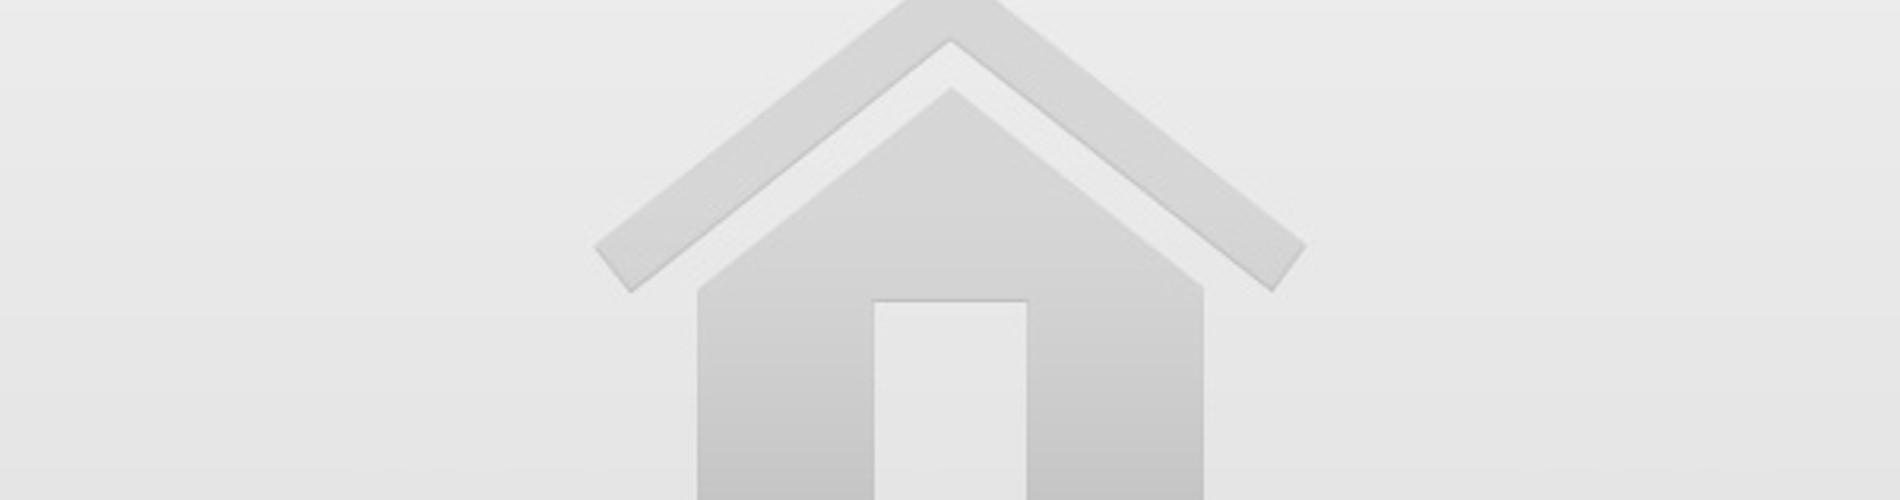 Vacation Rental Topacio Duplex Penthouses 3+2 Bedrooms